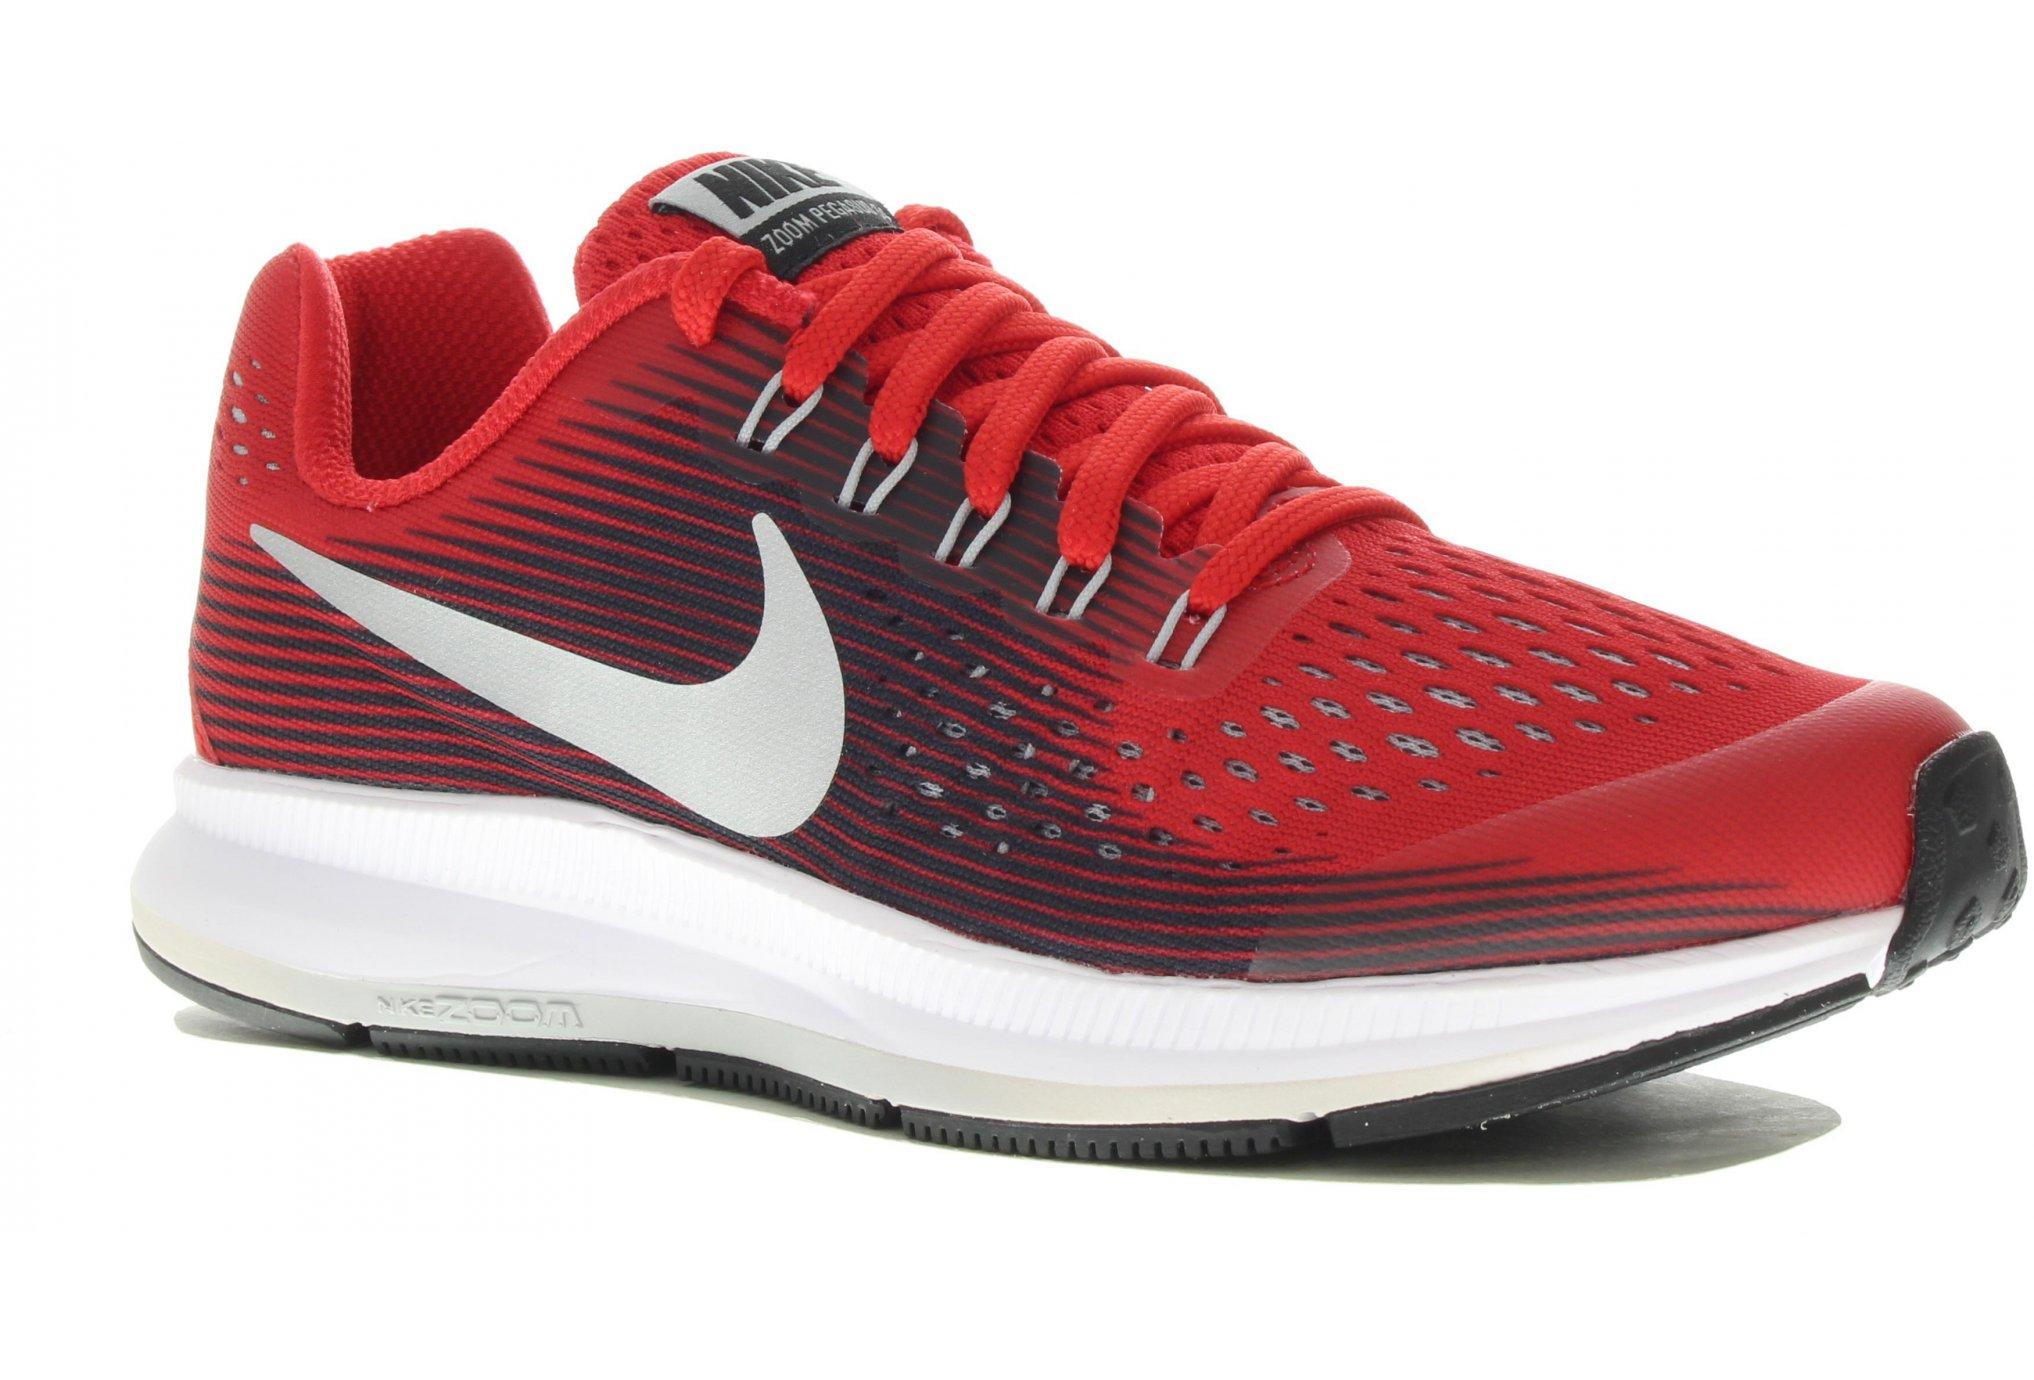 Nike Air Zoom Pegasus 34 GS Chaussures homme